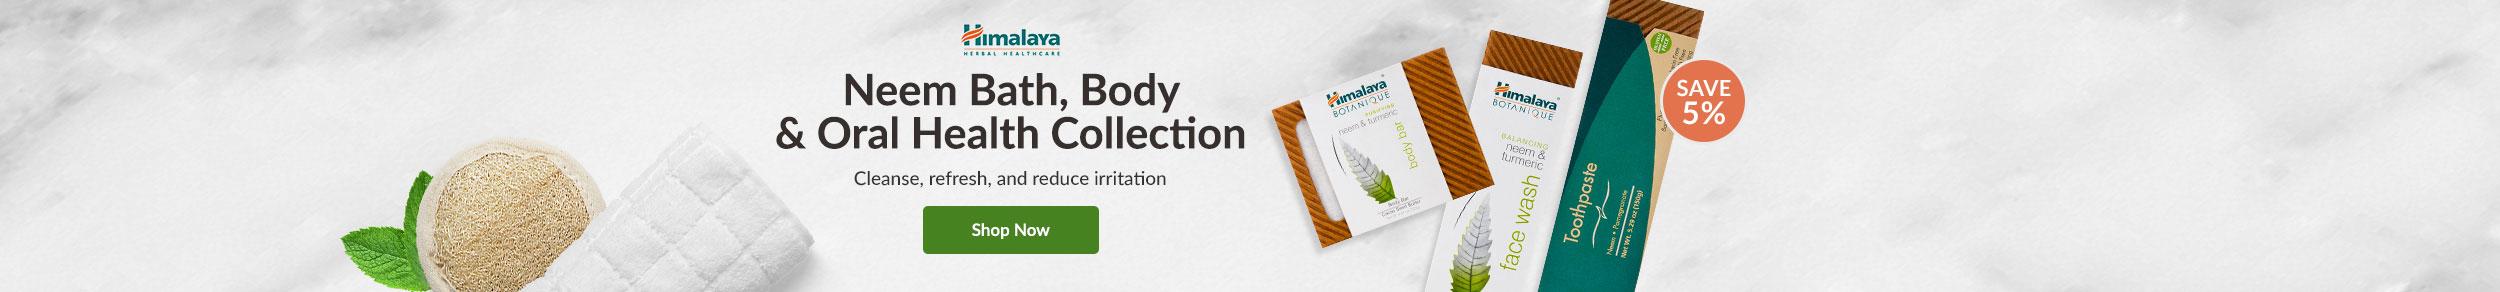 https://i3.pureformulas.net/images/static/Neem-Bath-Body-Oral-Health_slide3_061918.jpg